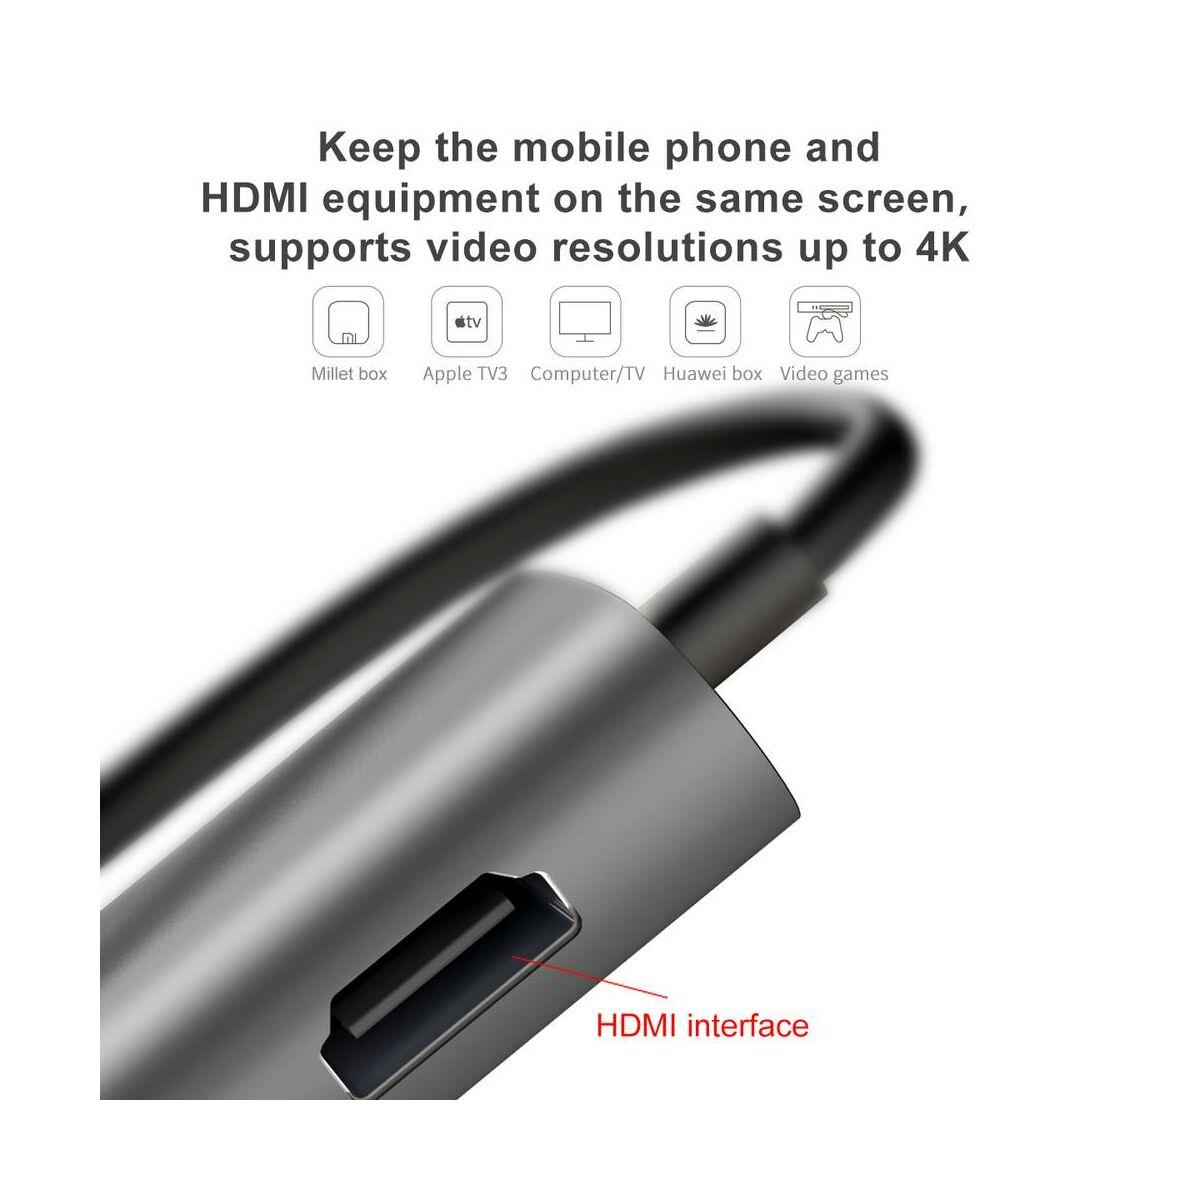 Baseus HUB, Almighty 8-in-1 (Type-C bementről - 3xUSB 3.0/HDMI/RJ45/PD/SD/TF) adapter, szürke (ACBOOK2-0G)